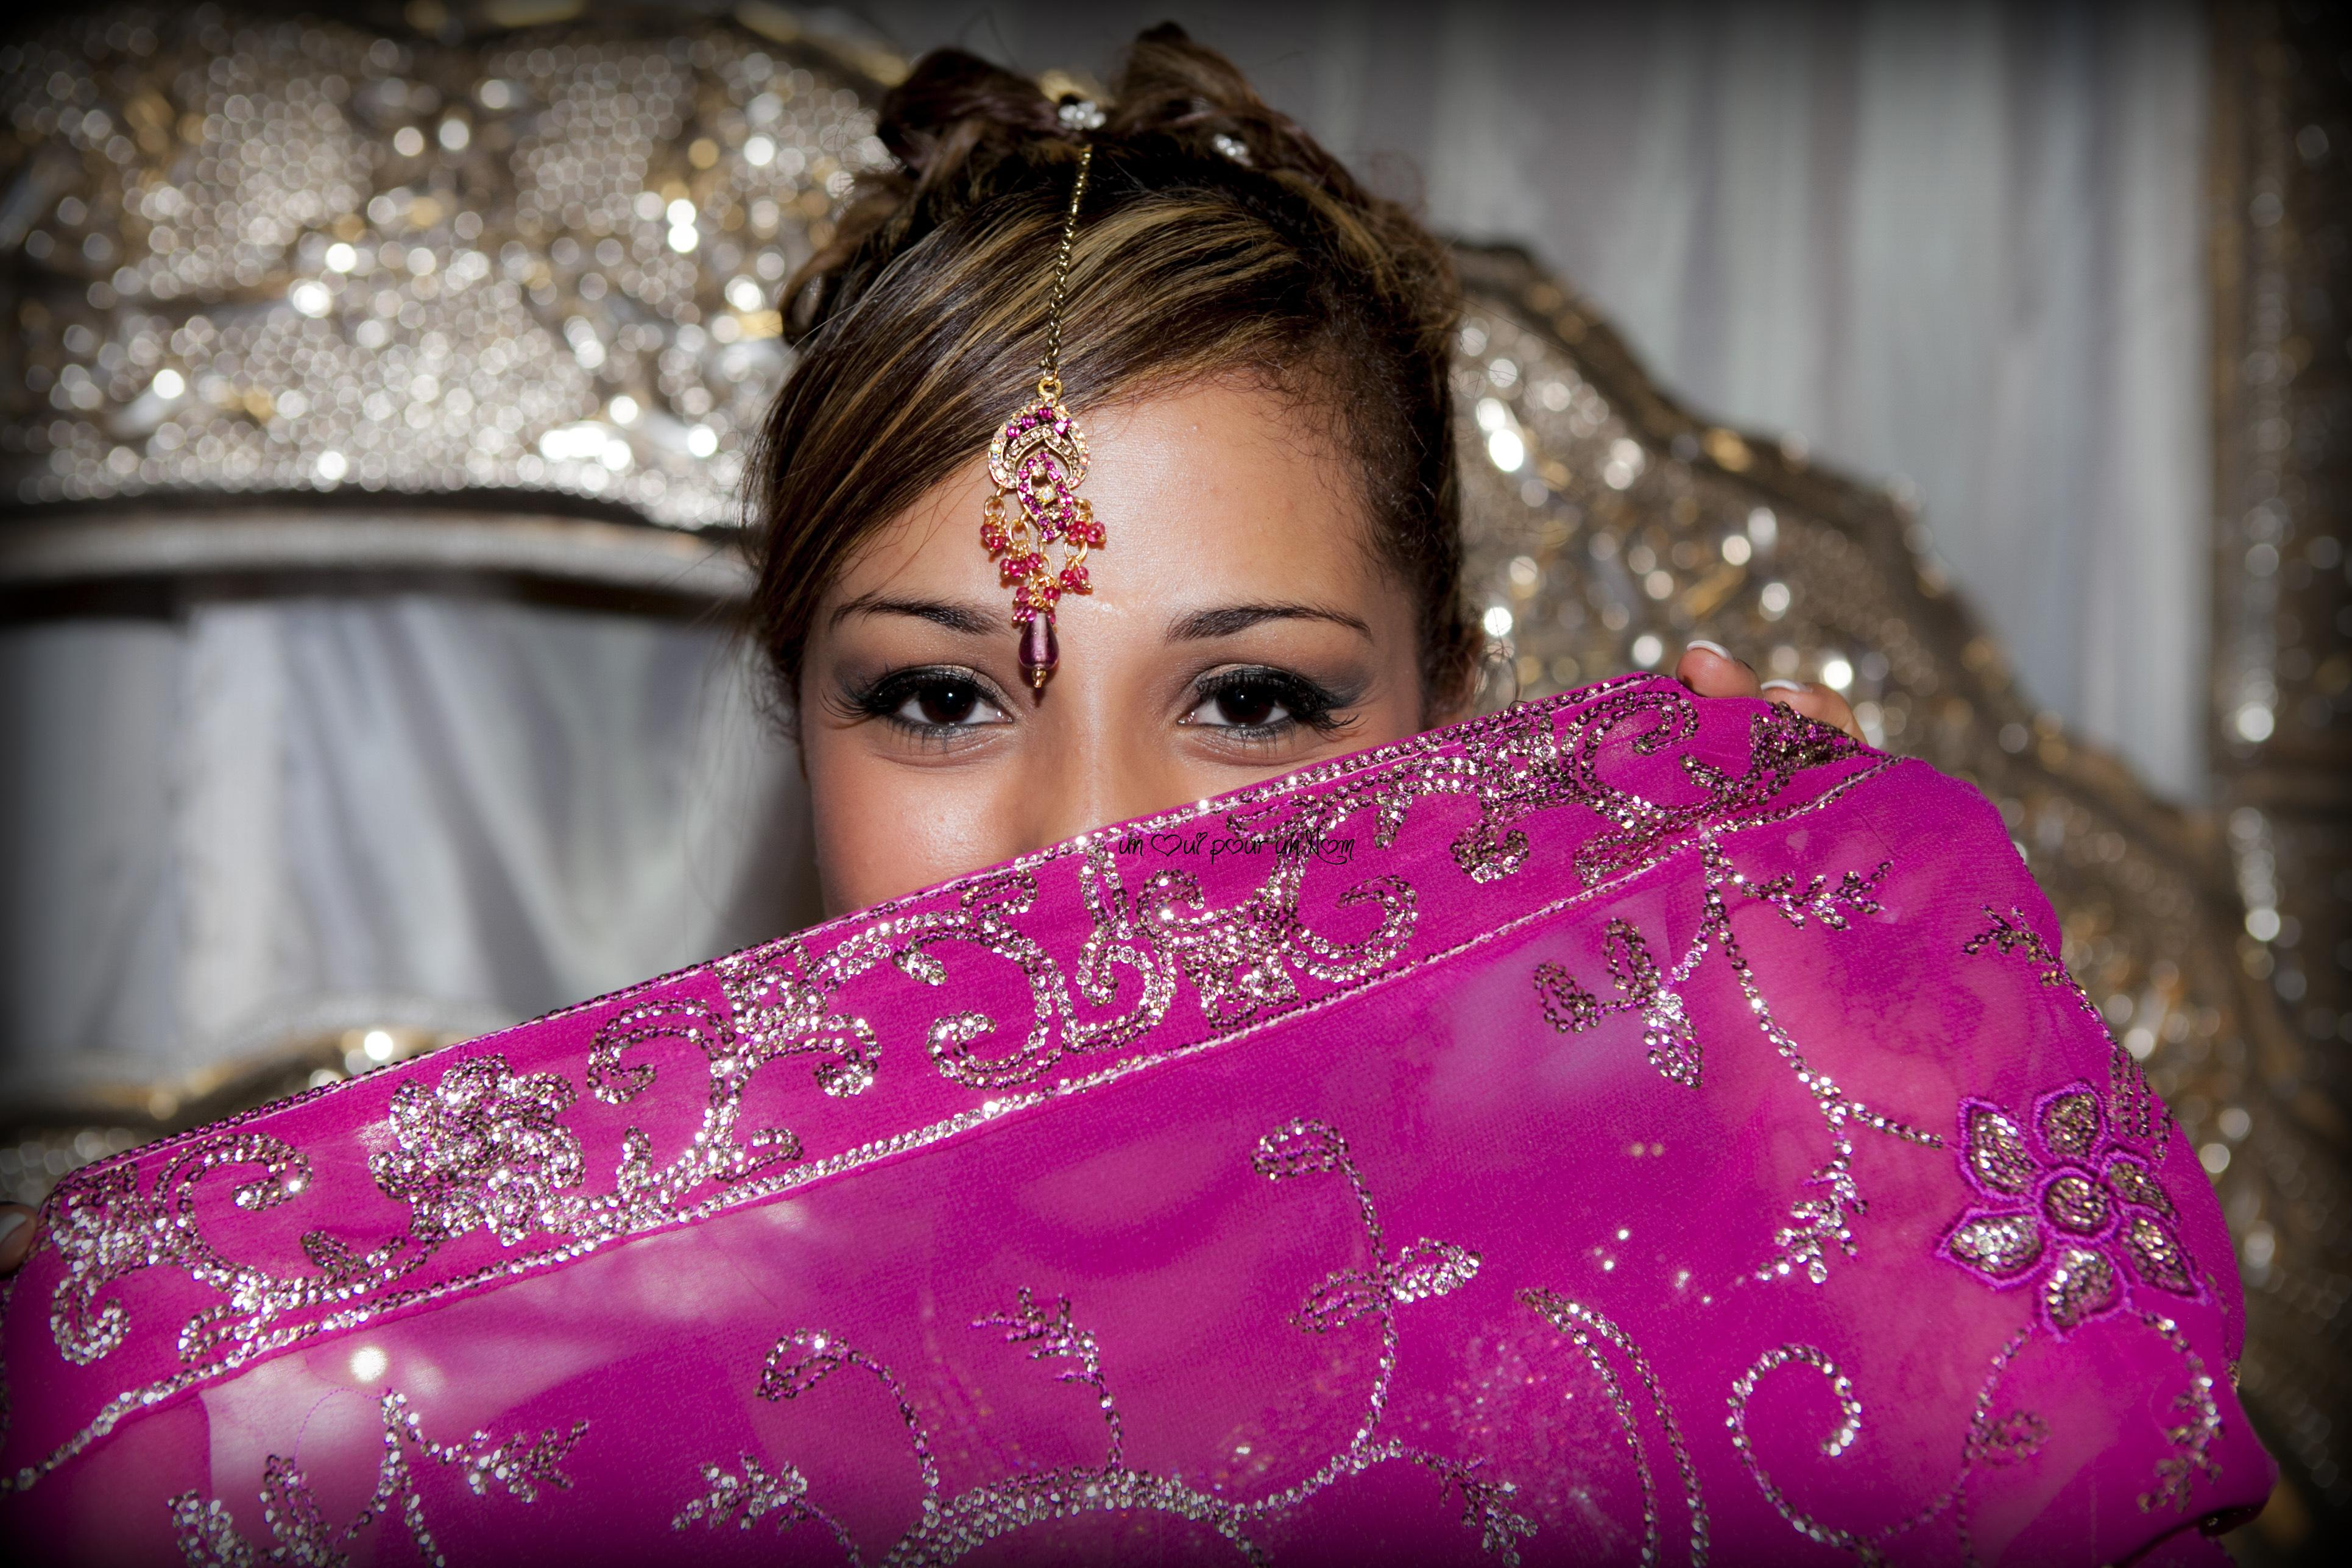 photographe cameraman mariage oriental arabe musulman carcassonne - Photographe Cameraman Mariage Oriental